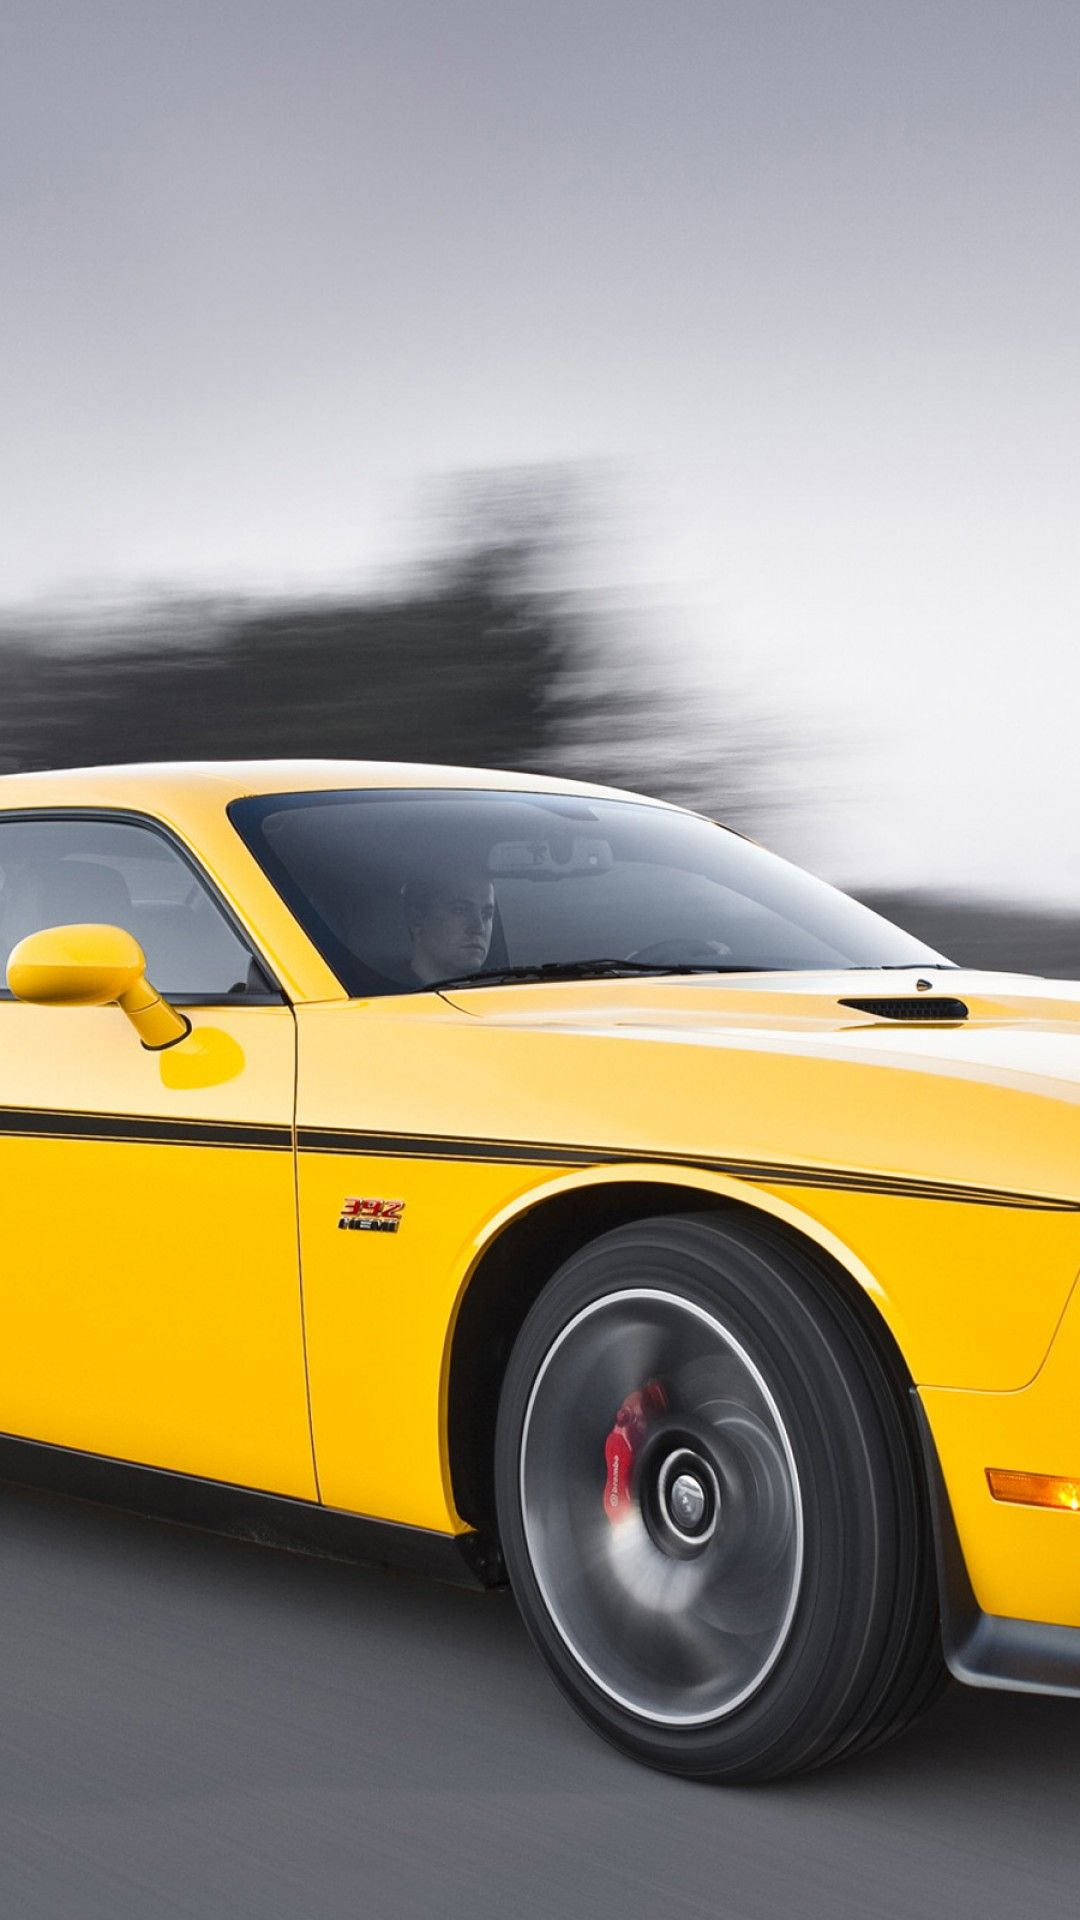 Dodge Challenger Yellow Jacket Iphone Plus Wallpaper Star Auto